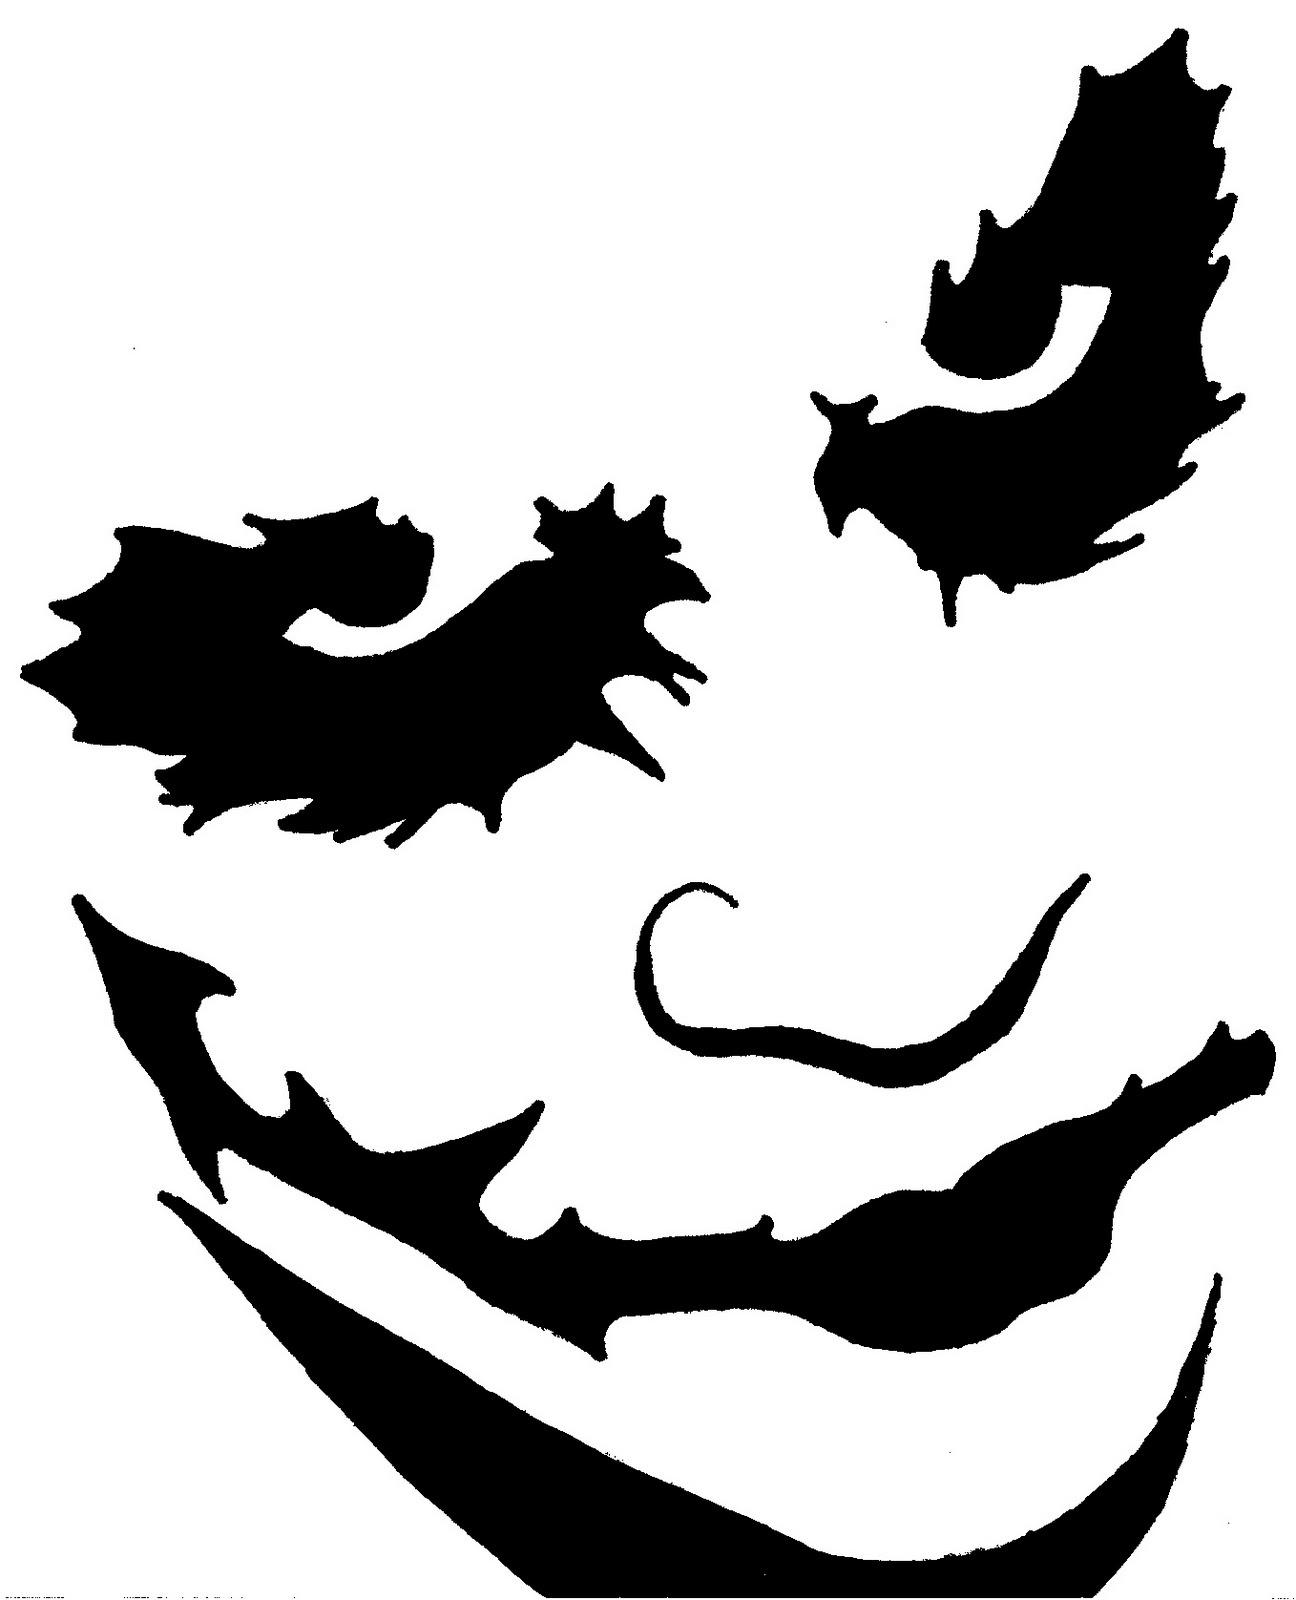 Free Batman Pumpkin Template, Download Free Clip Art, Free Clip Art - Pumpkin Cutouts Printable Free